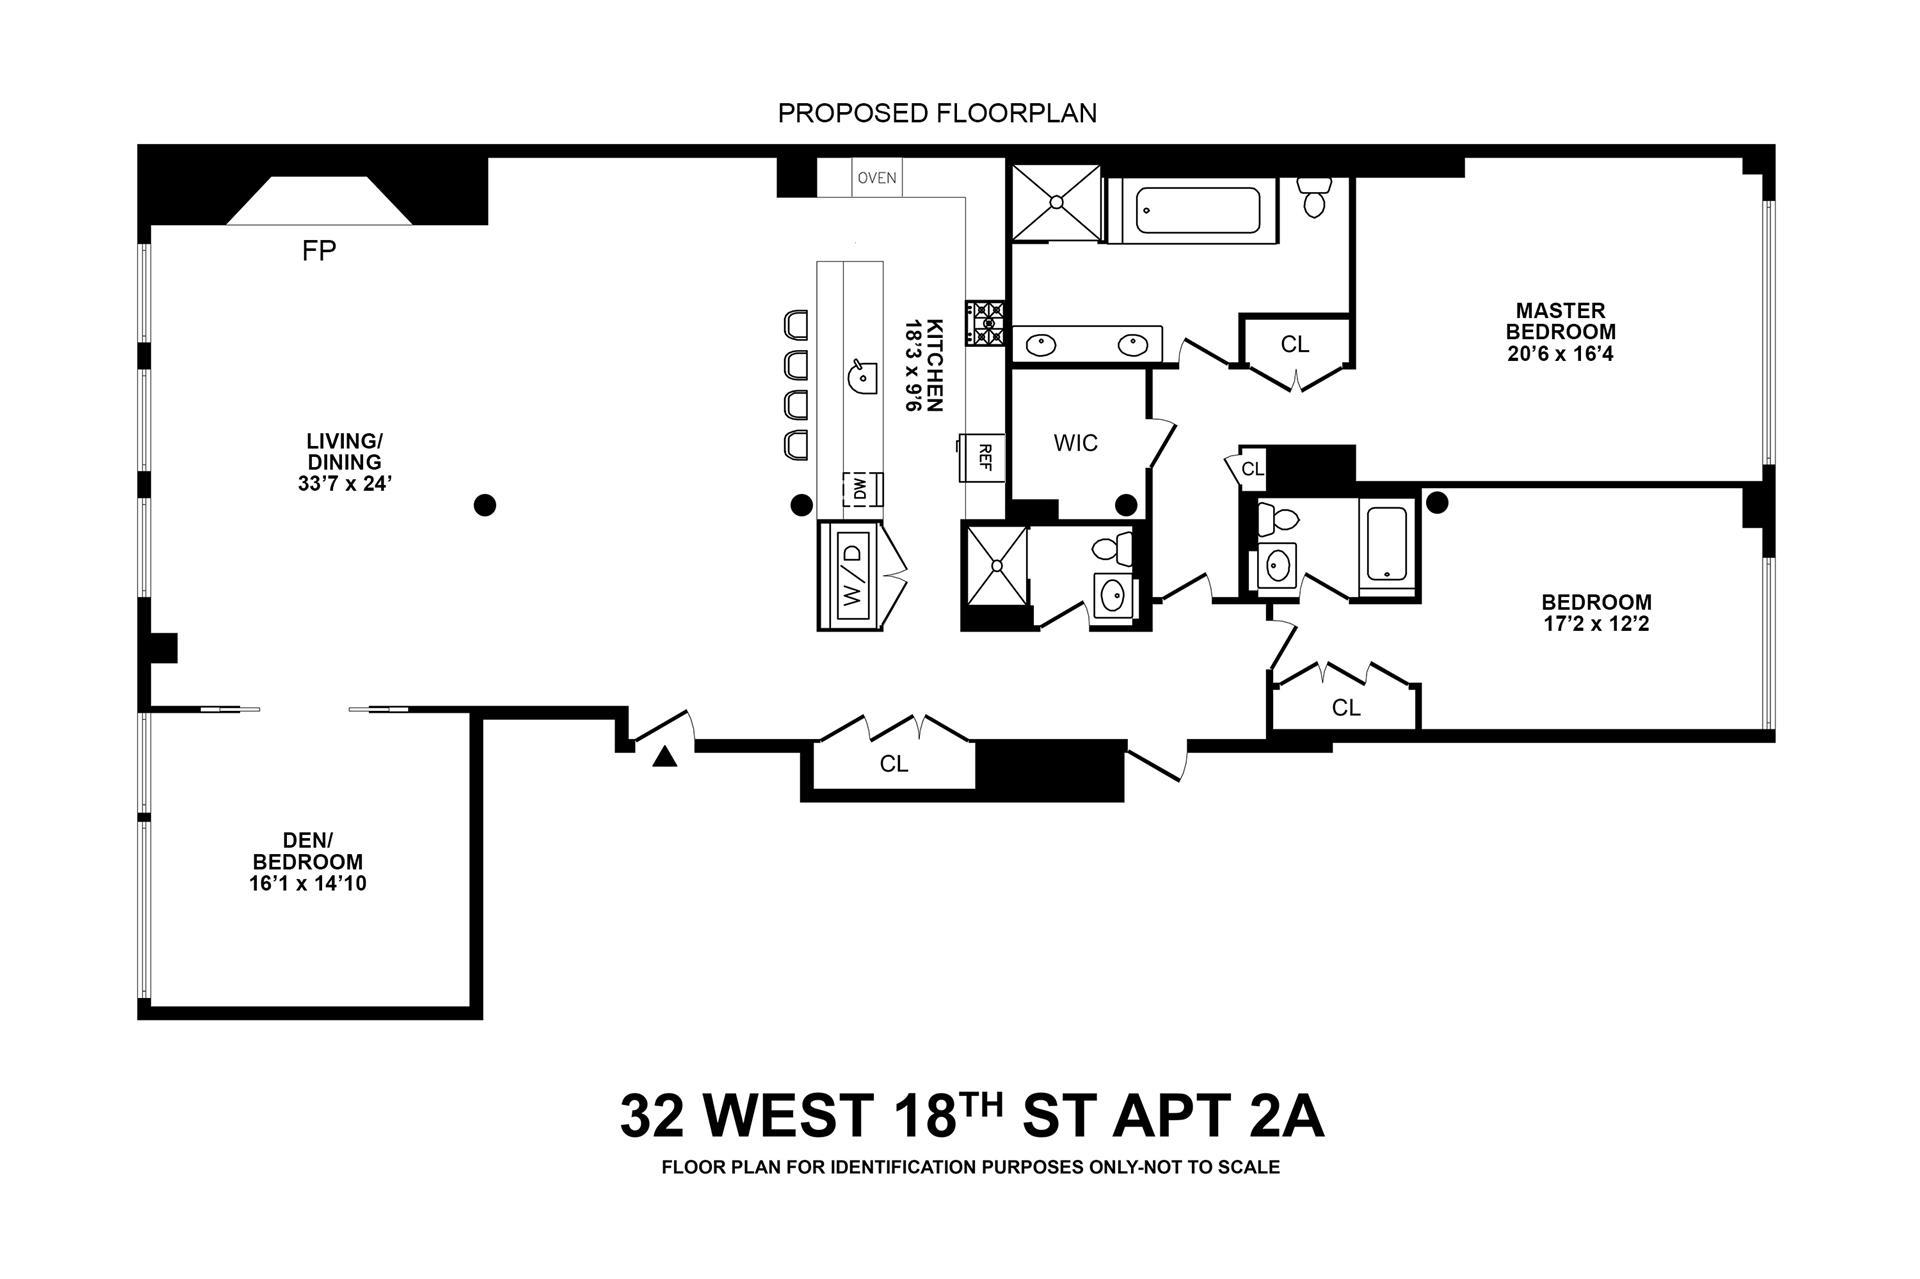 Floor plan of 32 West 18th St, 2A - Flatiron District, New York